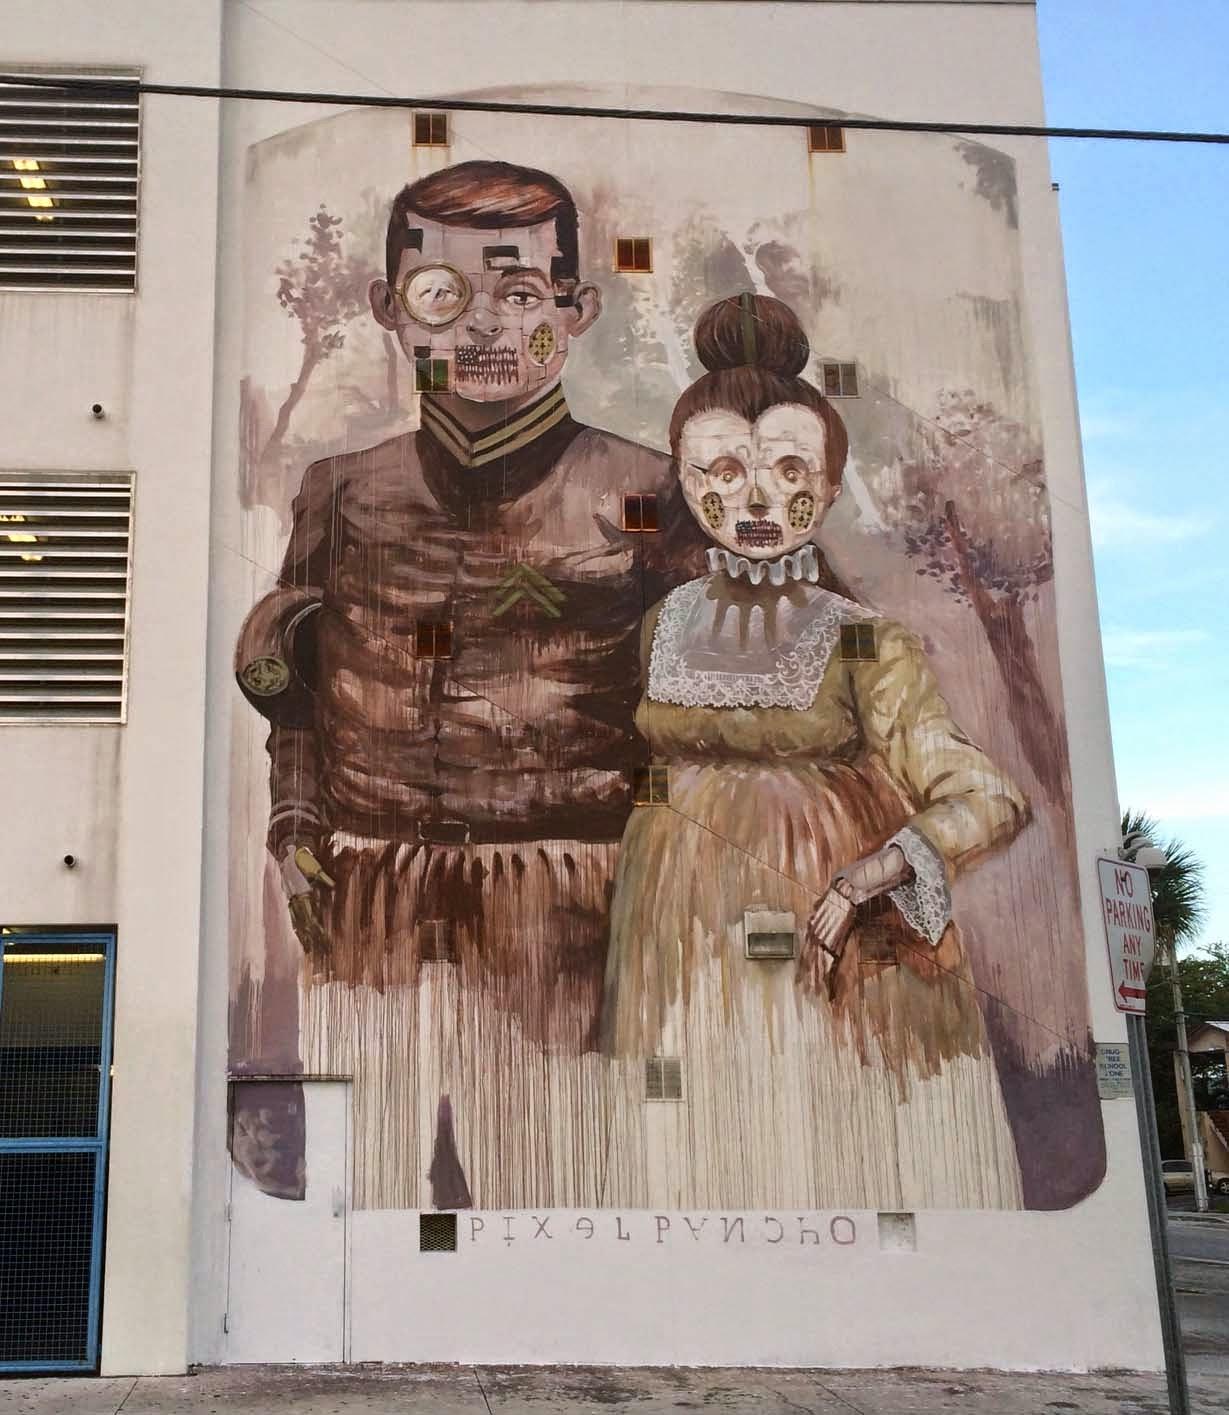 pixel-pancho-new-mural-for-art-basel-2014-02